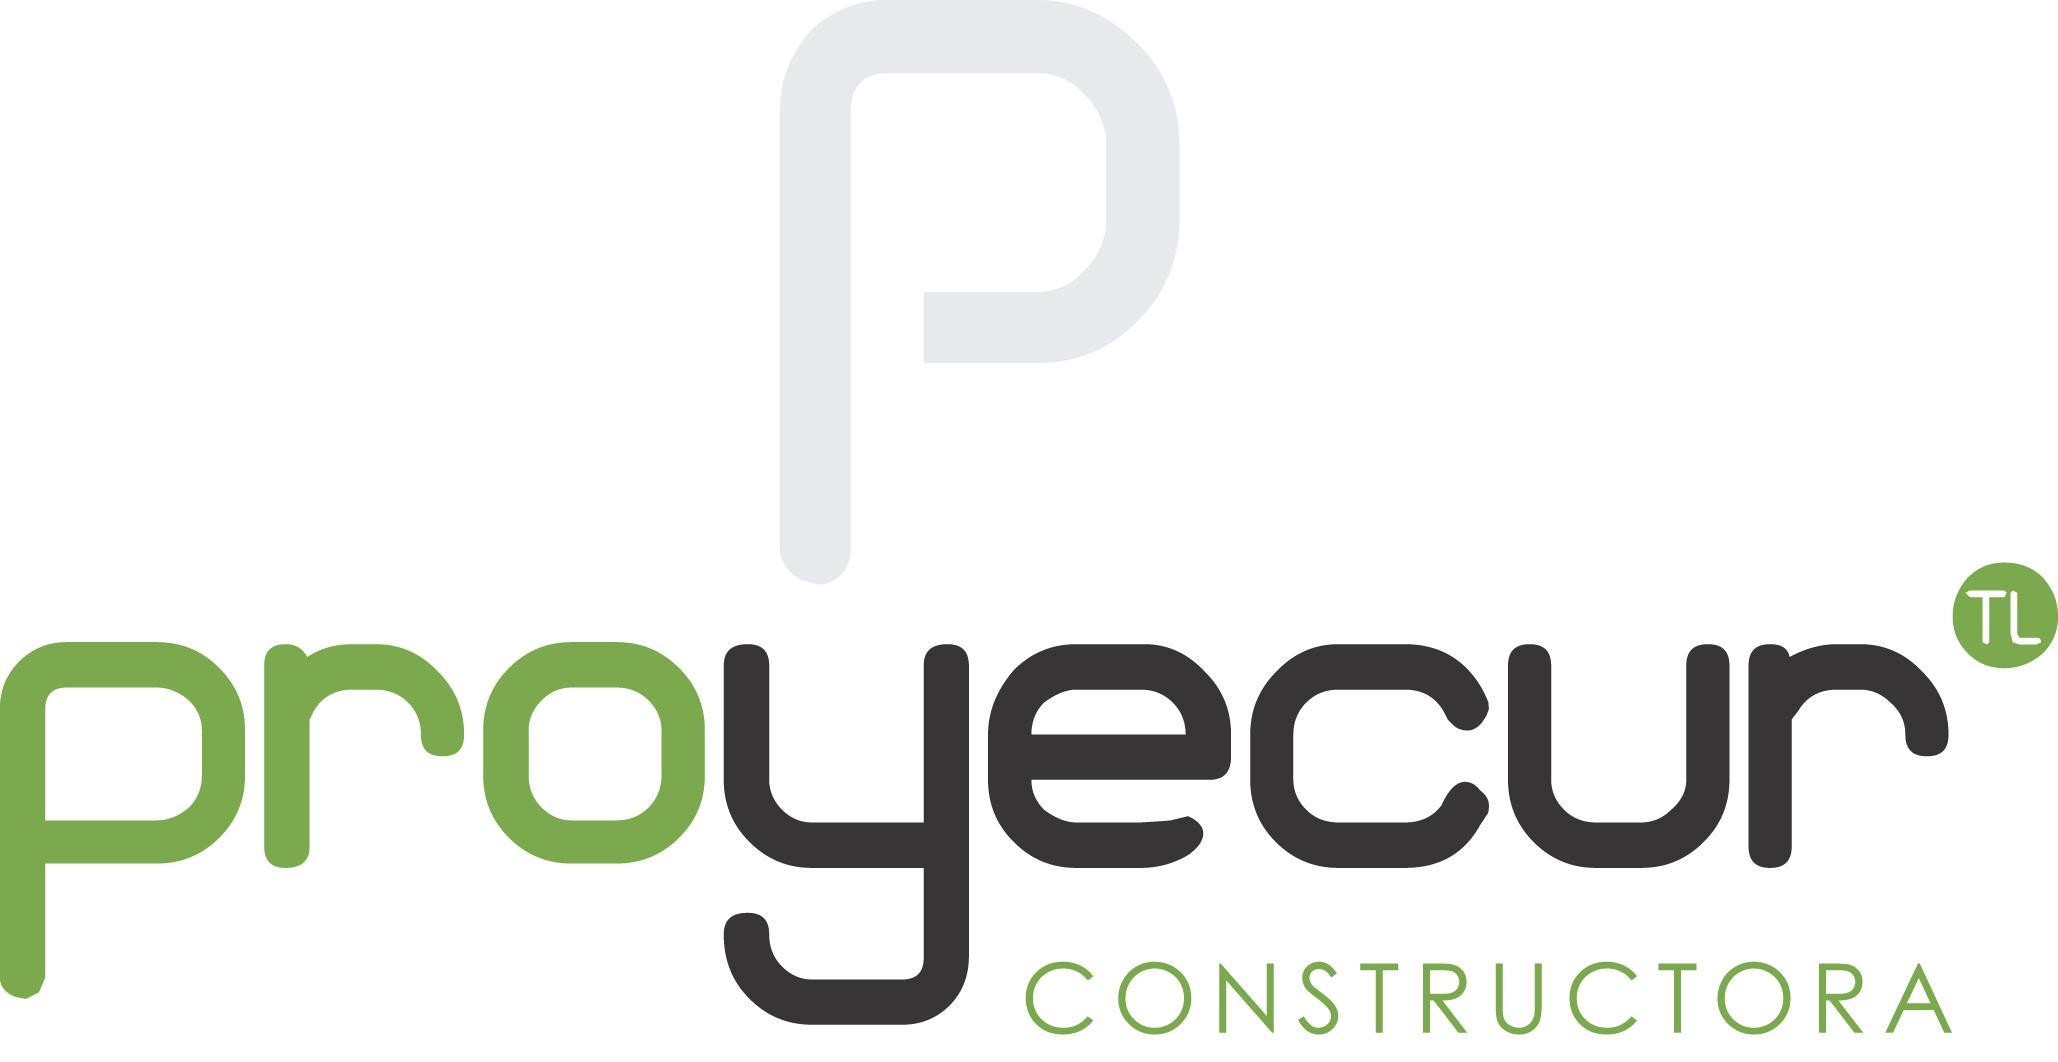 Proyecur Constructora